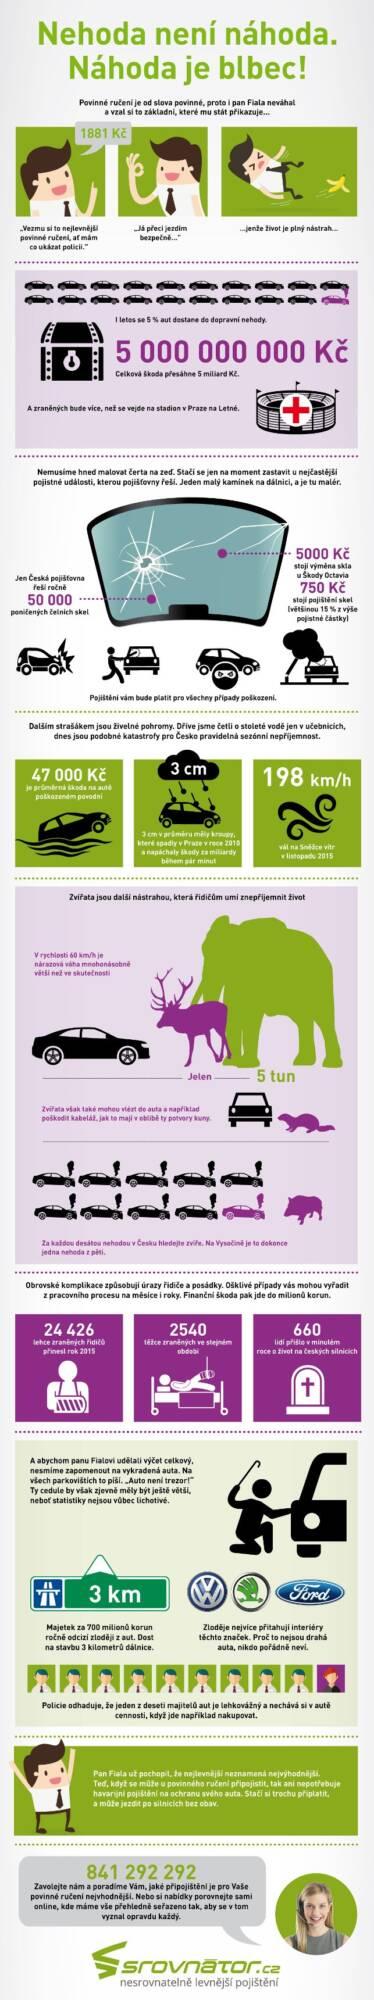 Infografika: Nehoda není náhoda. Náhoda je blbec!